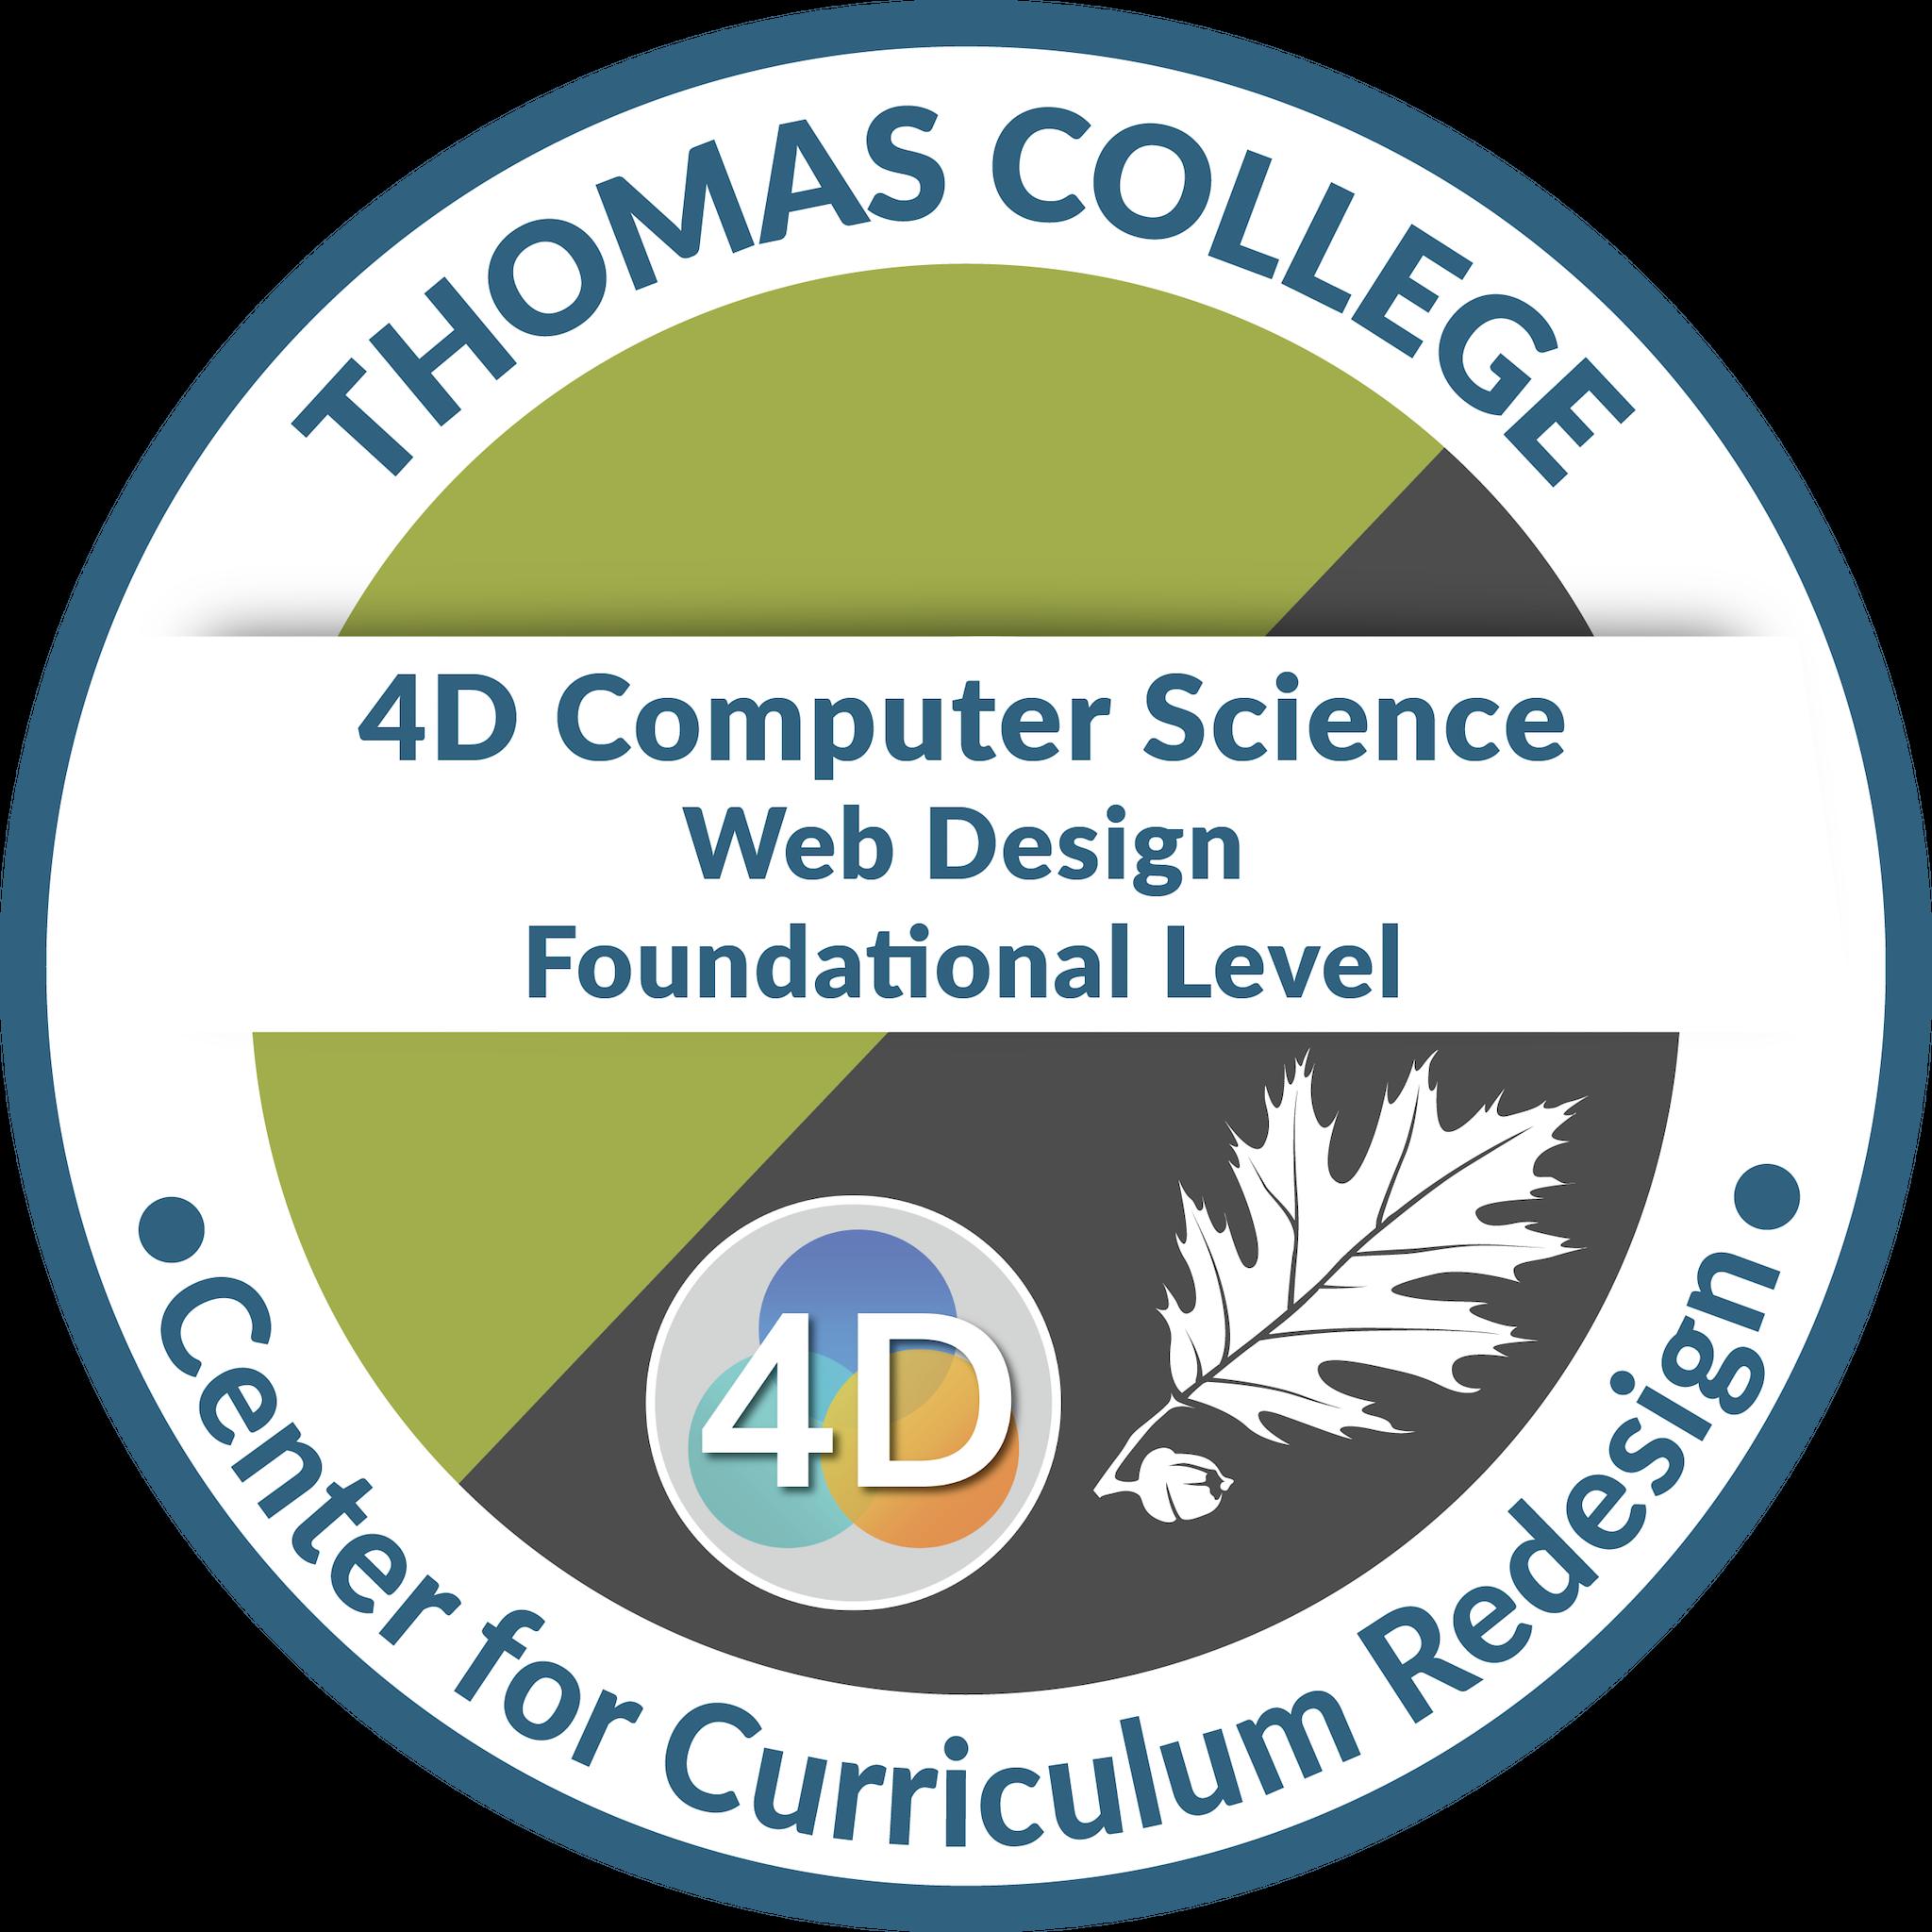 4D Computer Science: Web Design